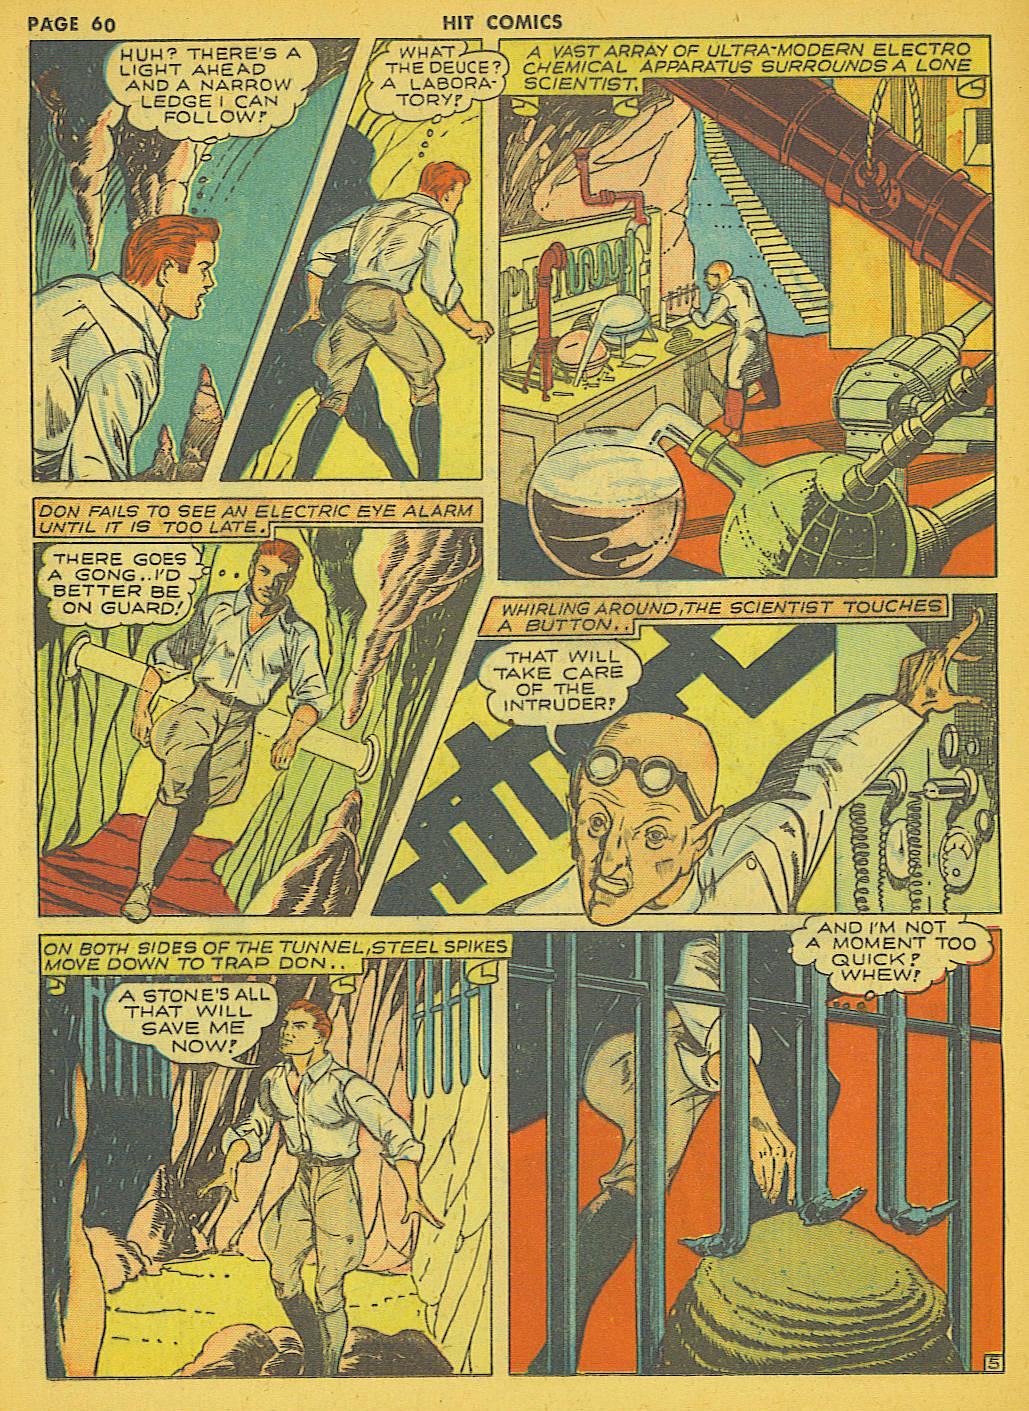 Read online Hit Comics comic -  Issue #21 - 62